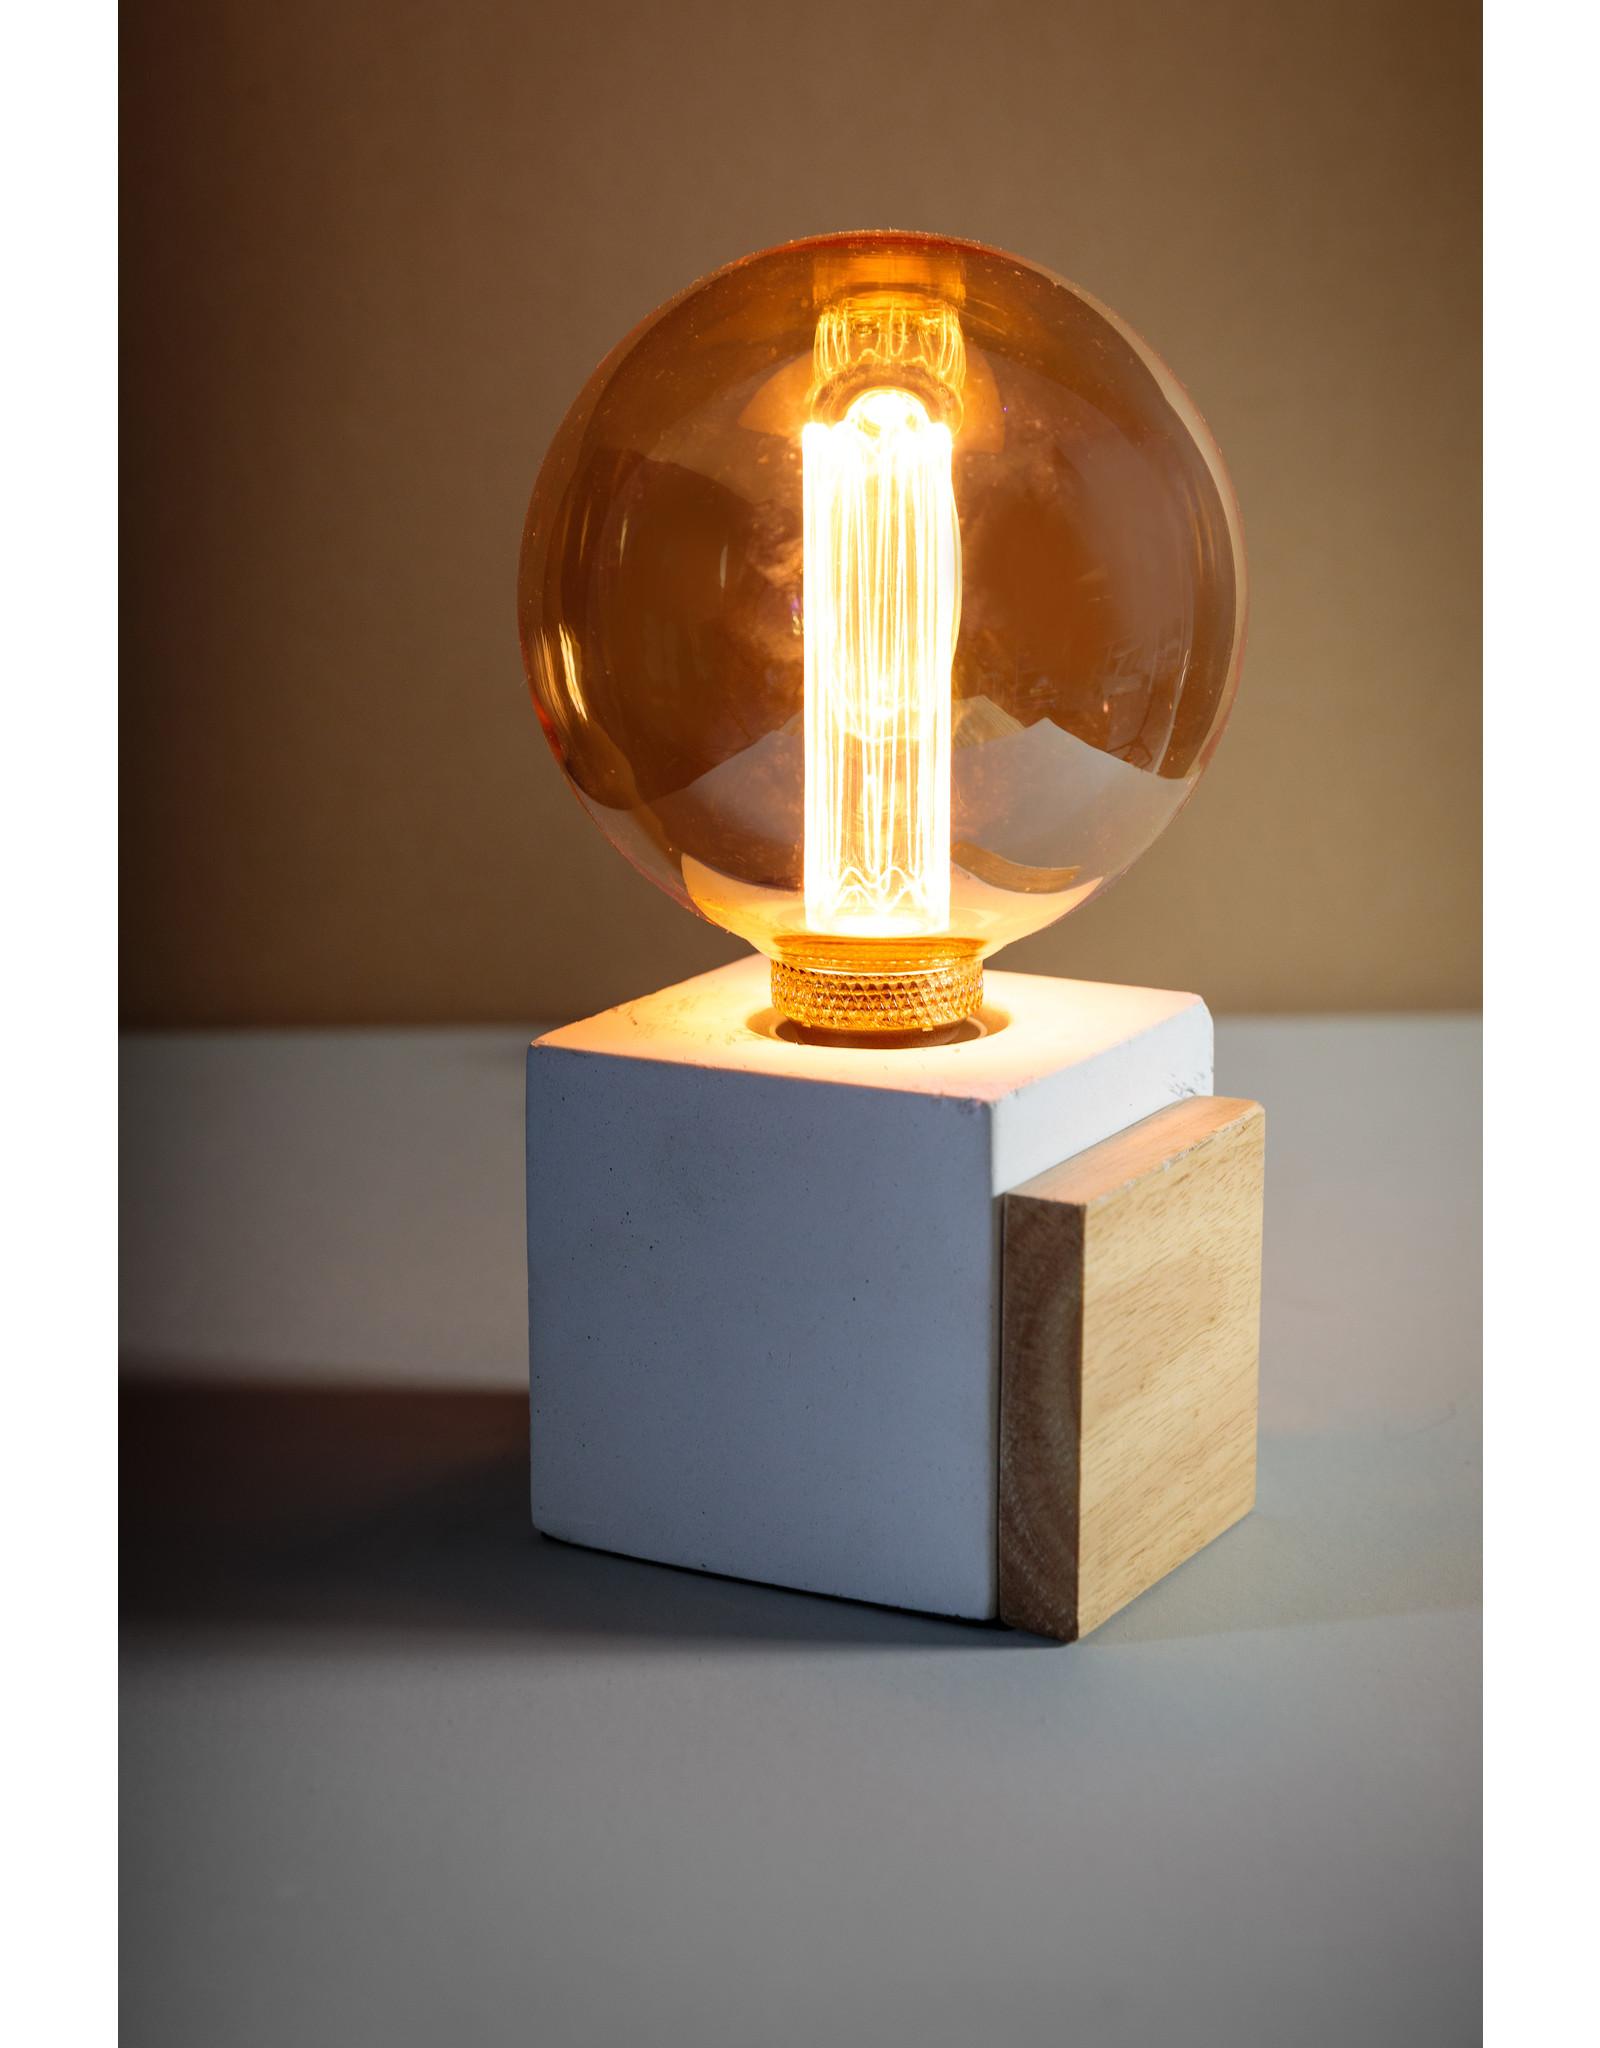 Cube tafellamp 1x E27 beton / hout